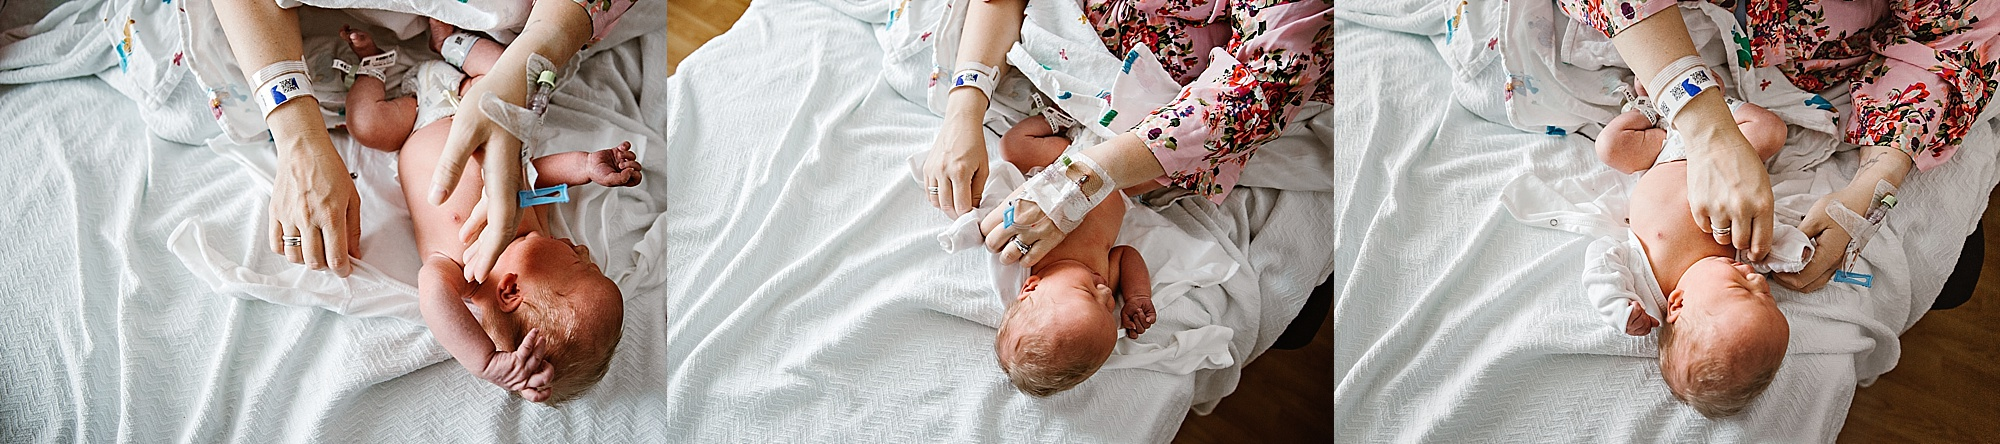 lauren-grayson-photography-akron-ohio-photographer-family-newborn-fresh-48-baby-hospital-photo-shoot-cleveland-clinic-akron-general-carter_0307.jpg